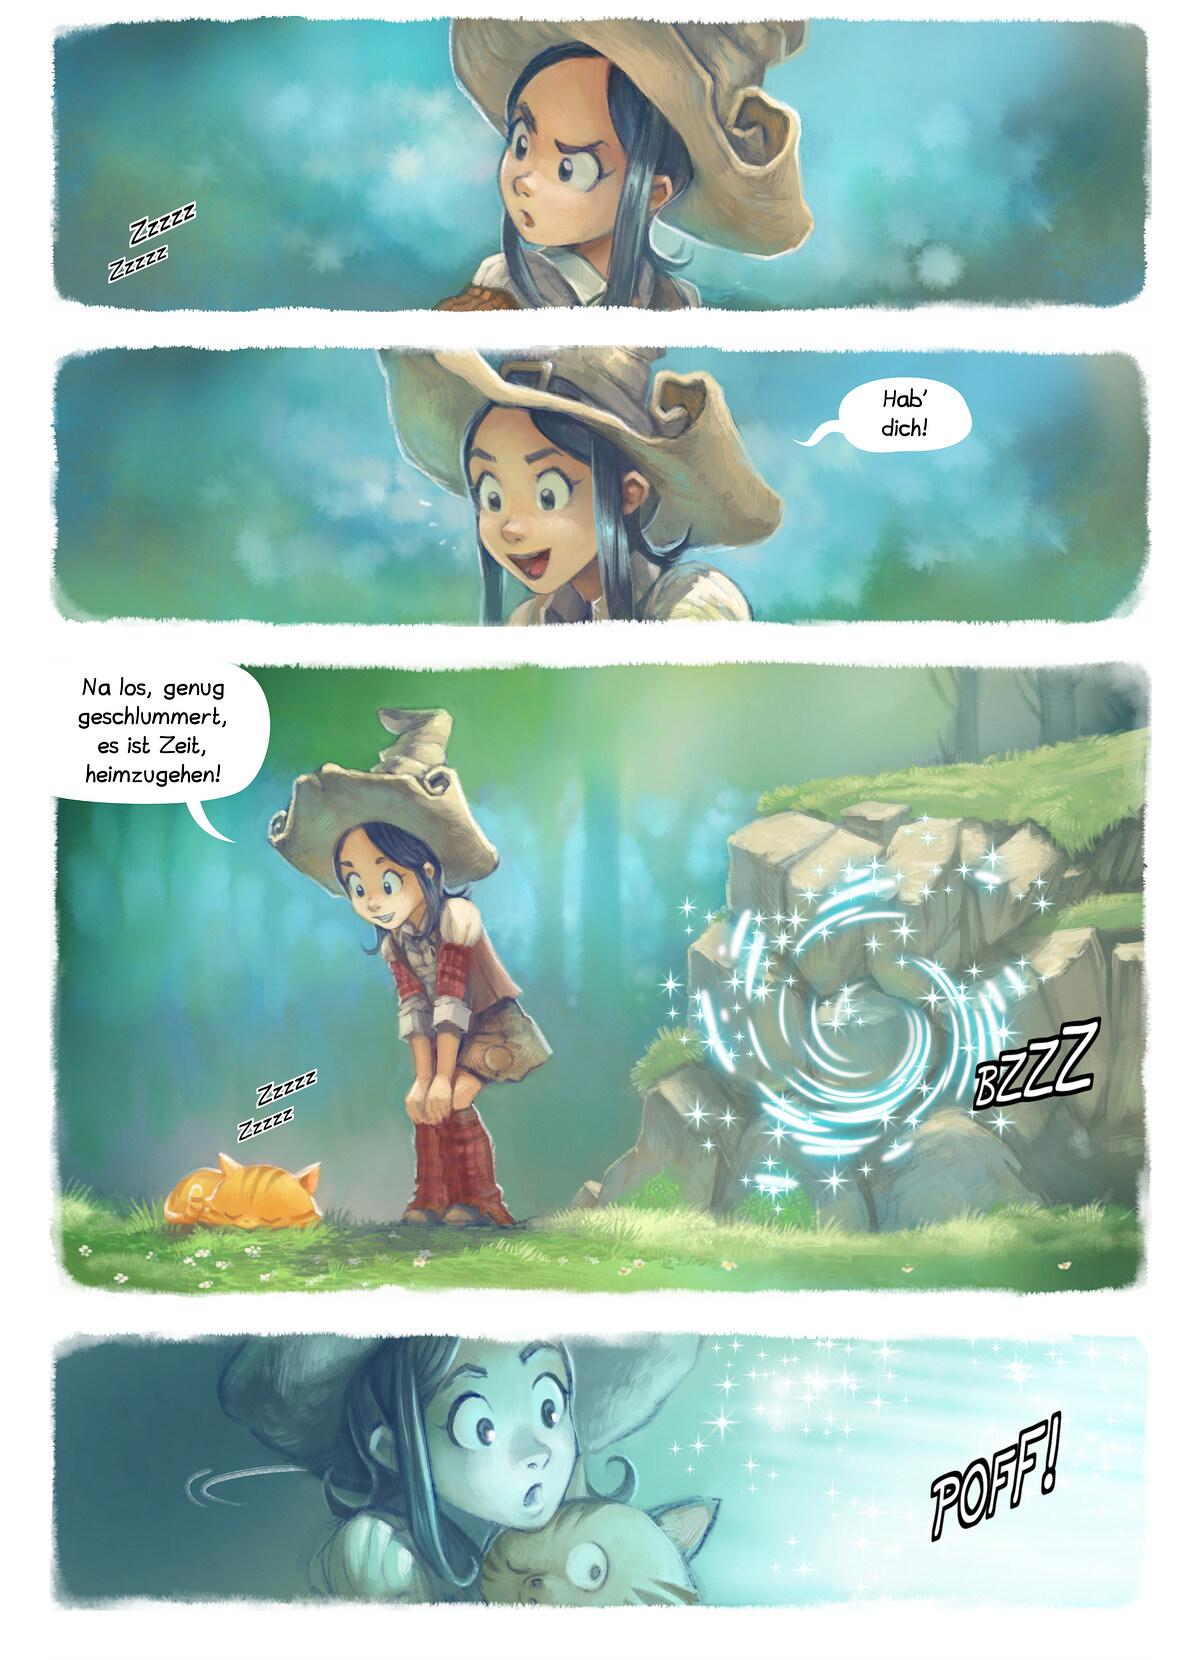 A webcomic page of Pepper&Carrot, Episode 7 [de], Seite 2